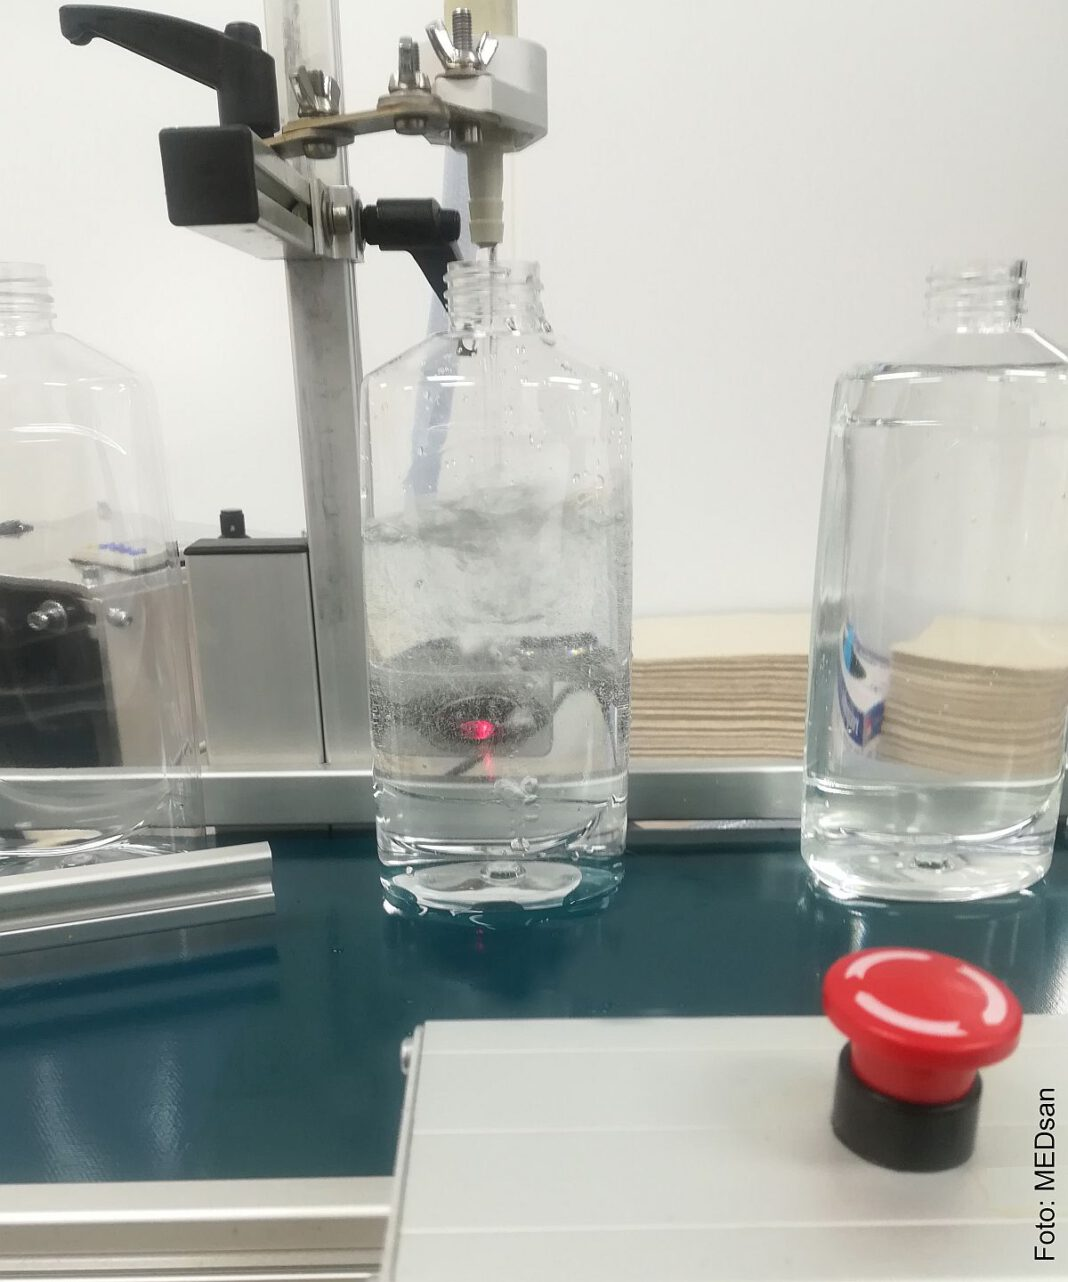 Produktion der sanaSEP Desinfektionslösung wird angekurbelt.